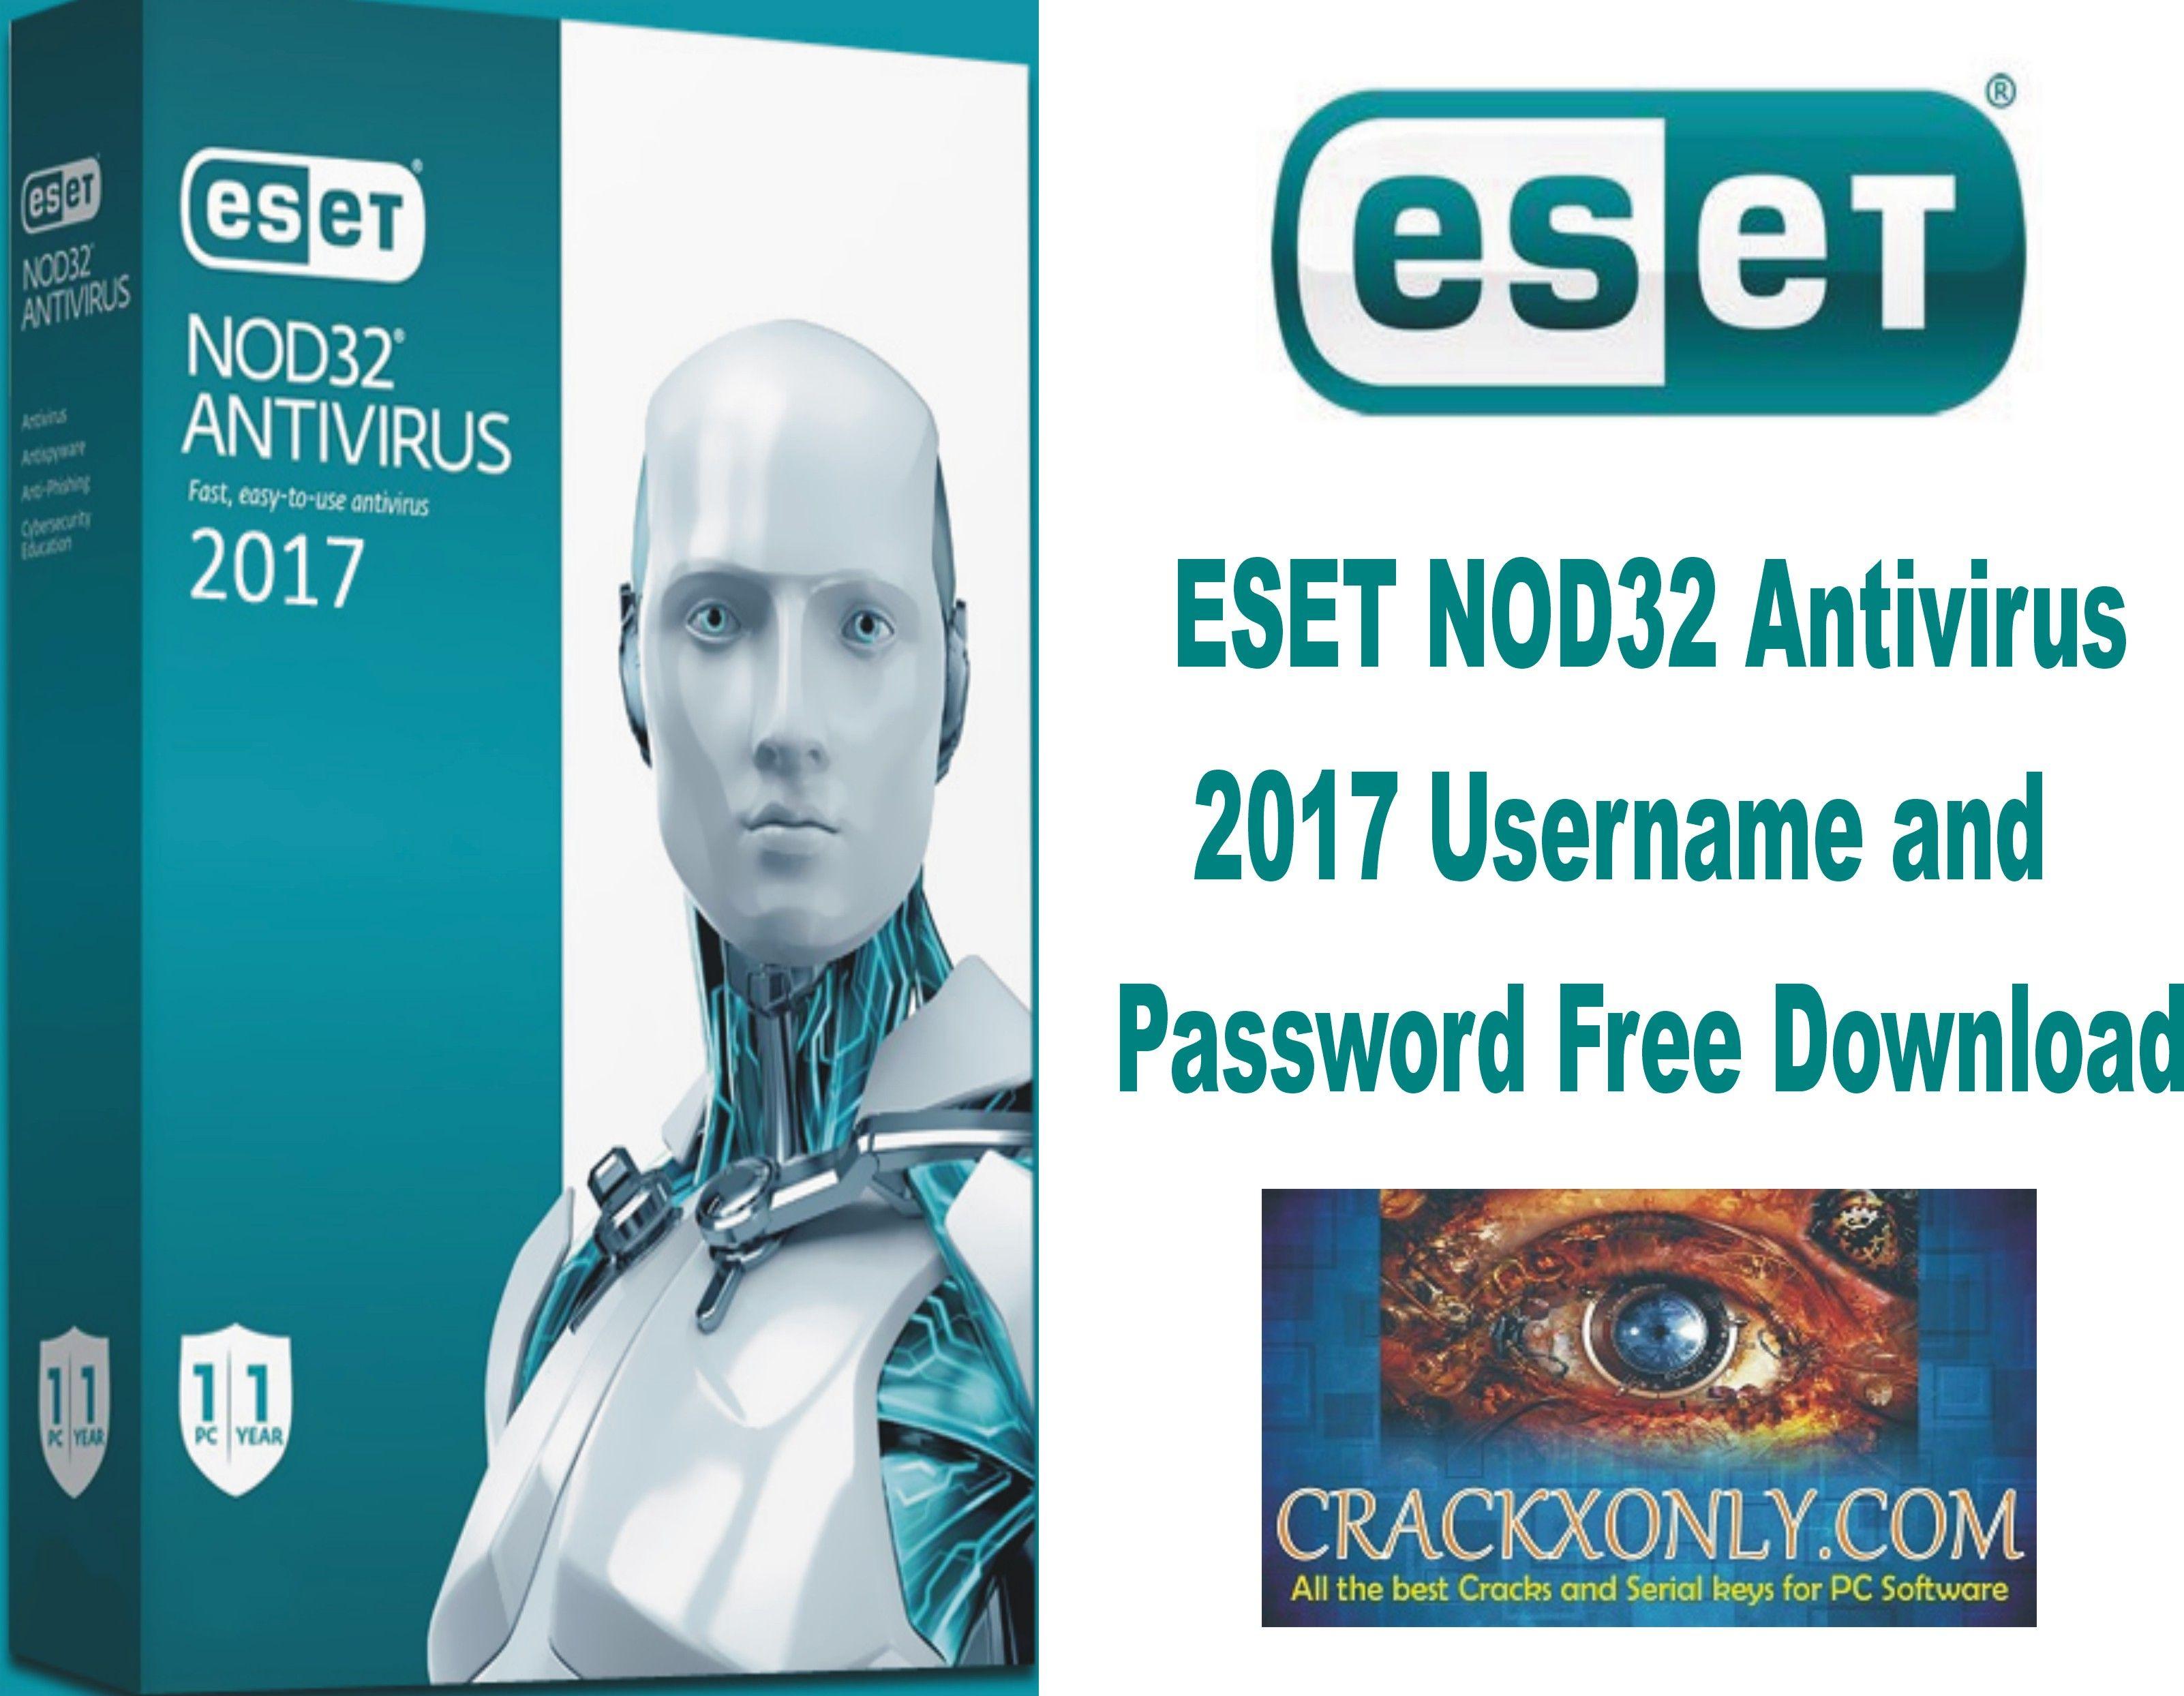 eset nod32 antivirus free download full version with crack